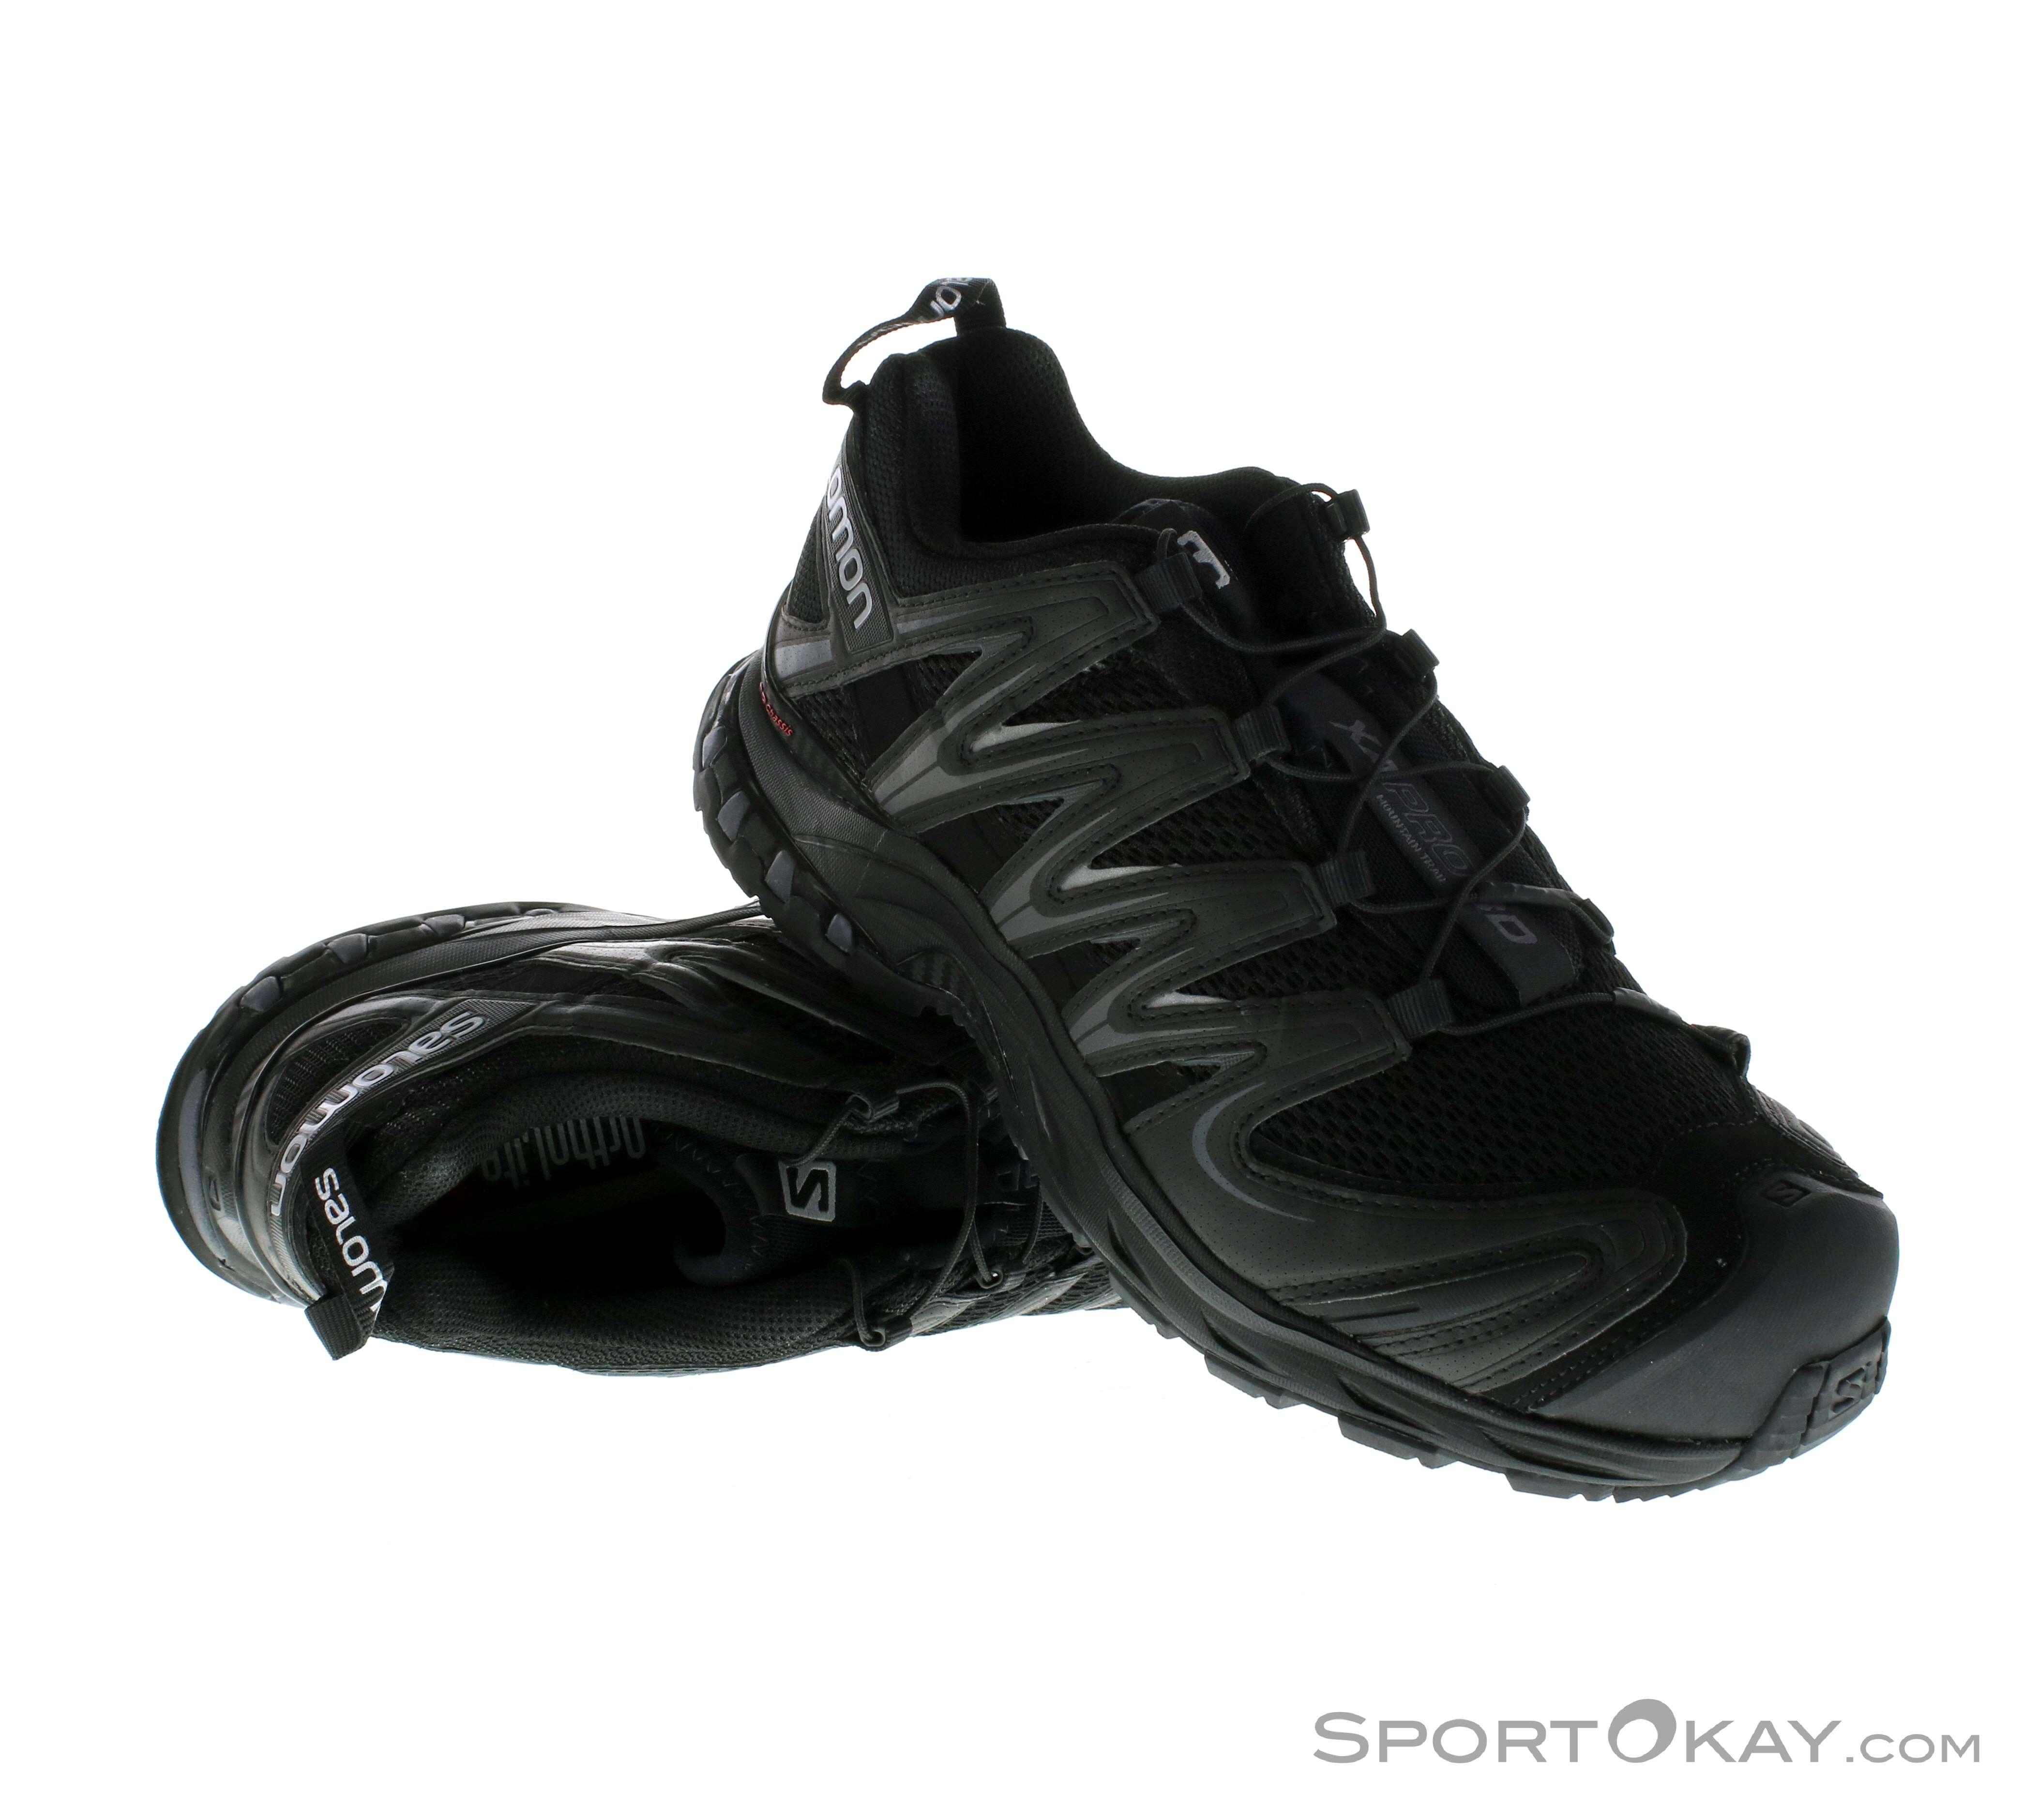 Pro Running Xa Salomon Uomo Scarpe Trail 3d Da PnqZA6Z5F 944dfe9f733